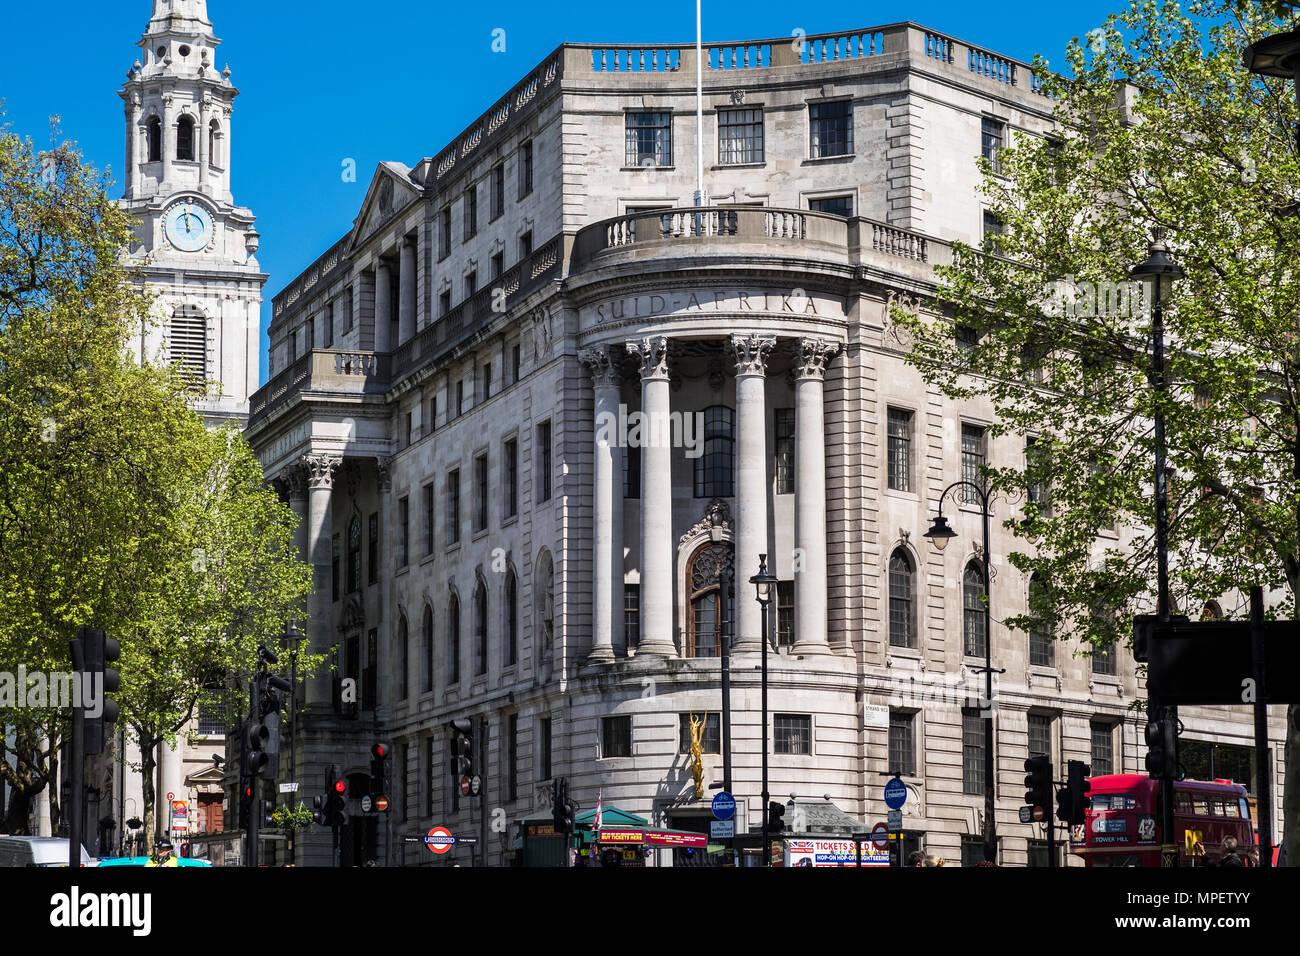 South Africa House, Trafalgar Square, London, England, U.K. - Stock Image